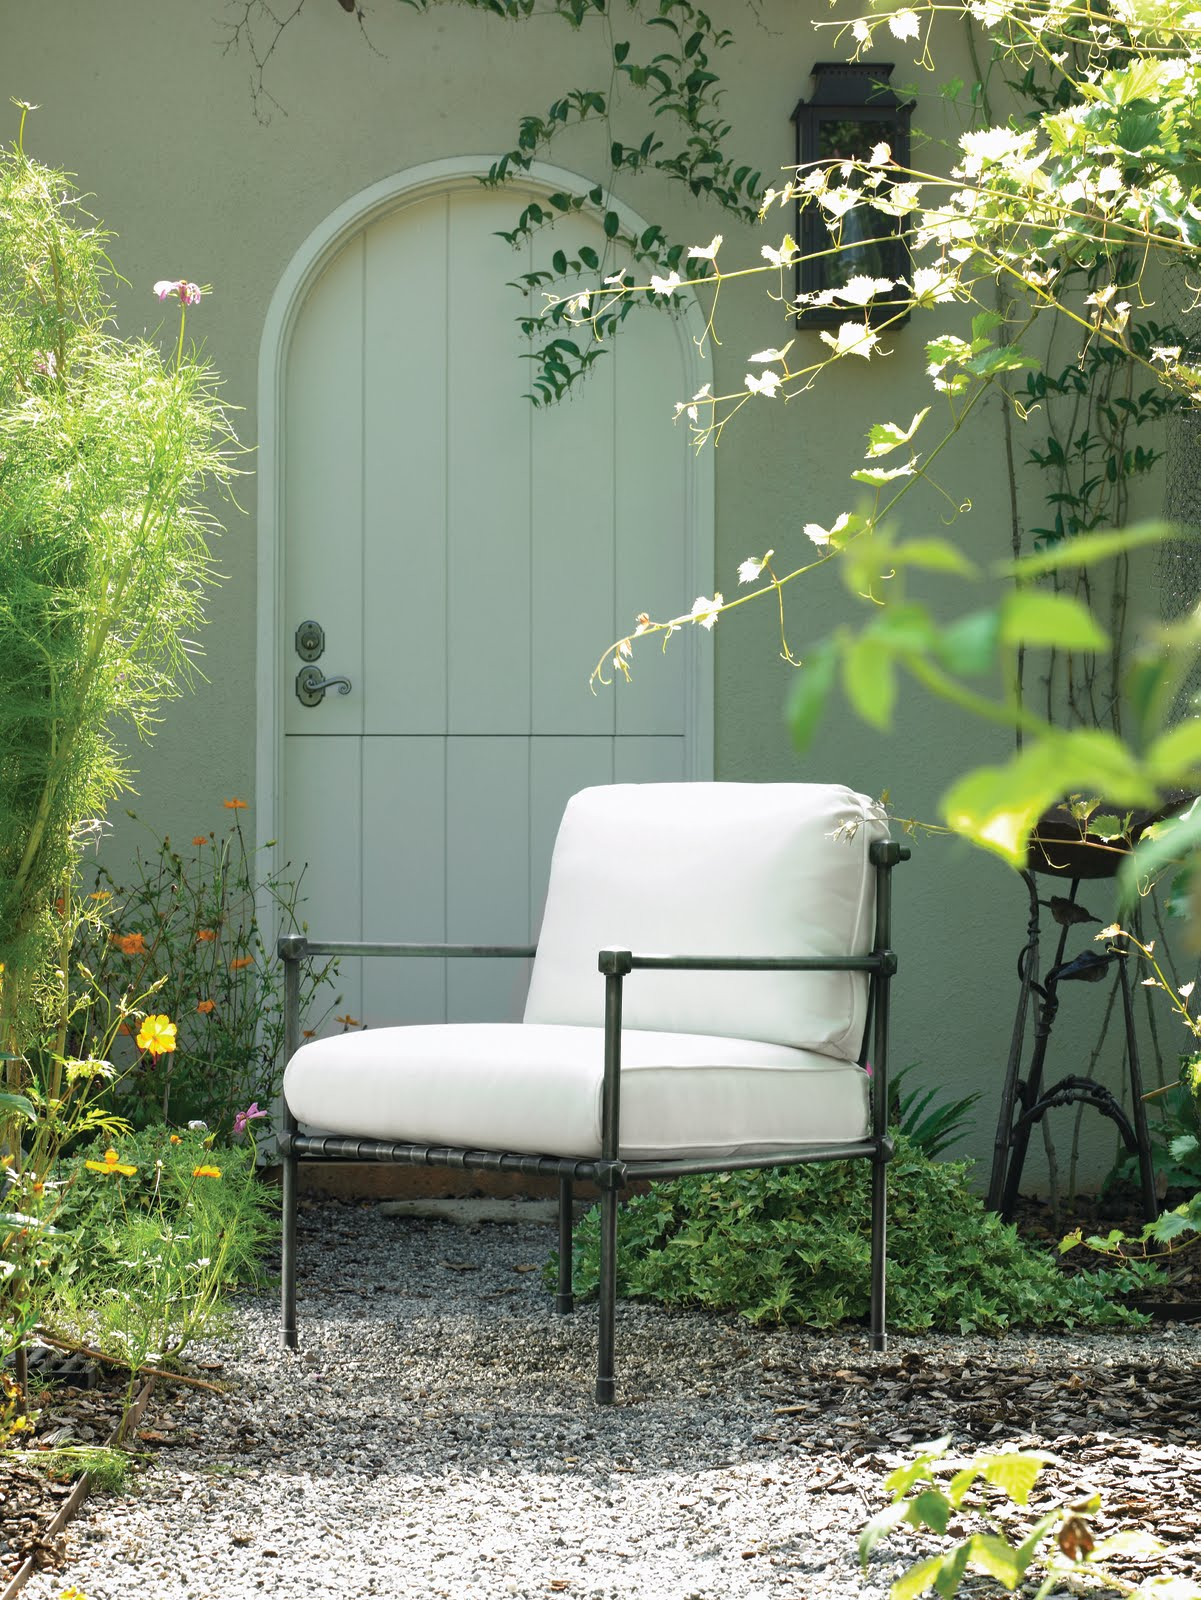 Eberly collard pr september 2010 for Bullnose chaise outdoor cushion